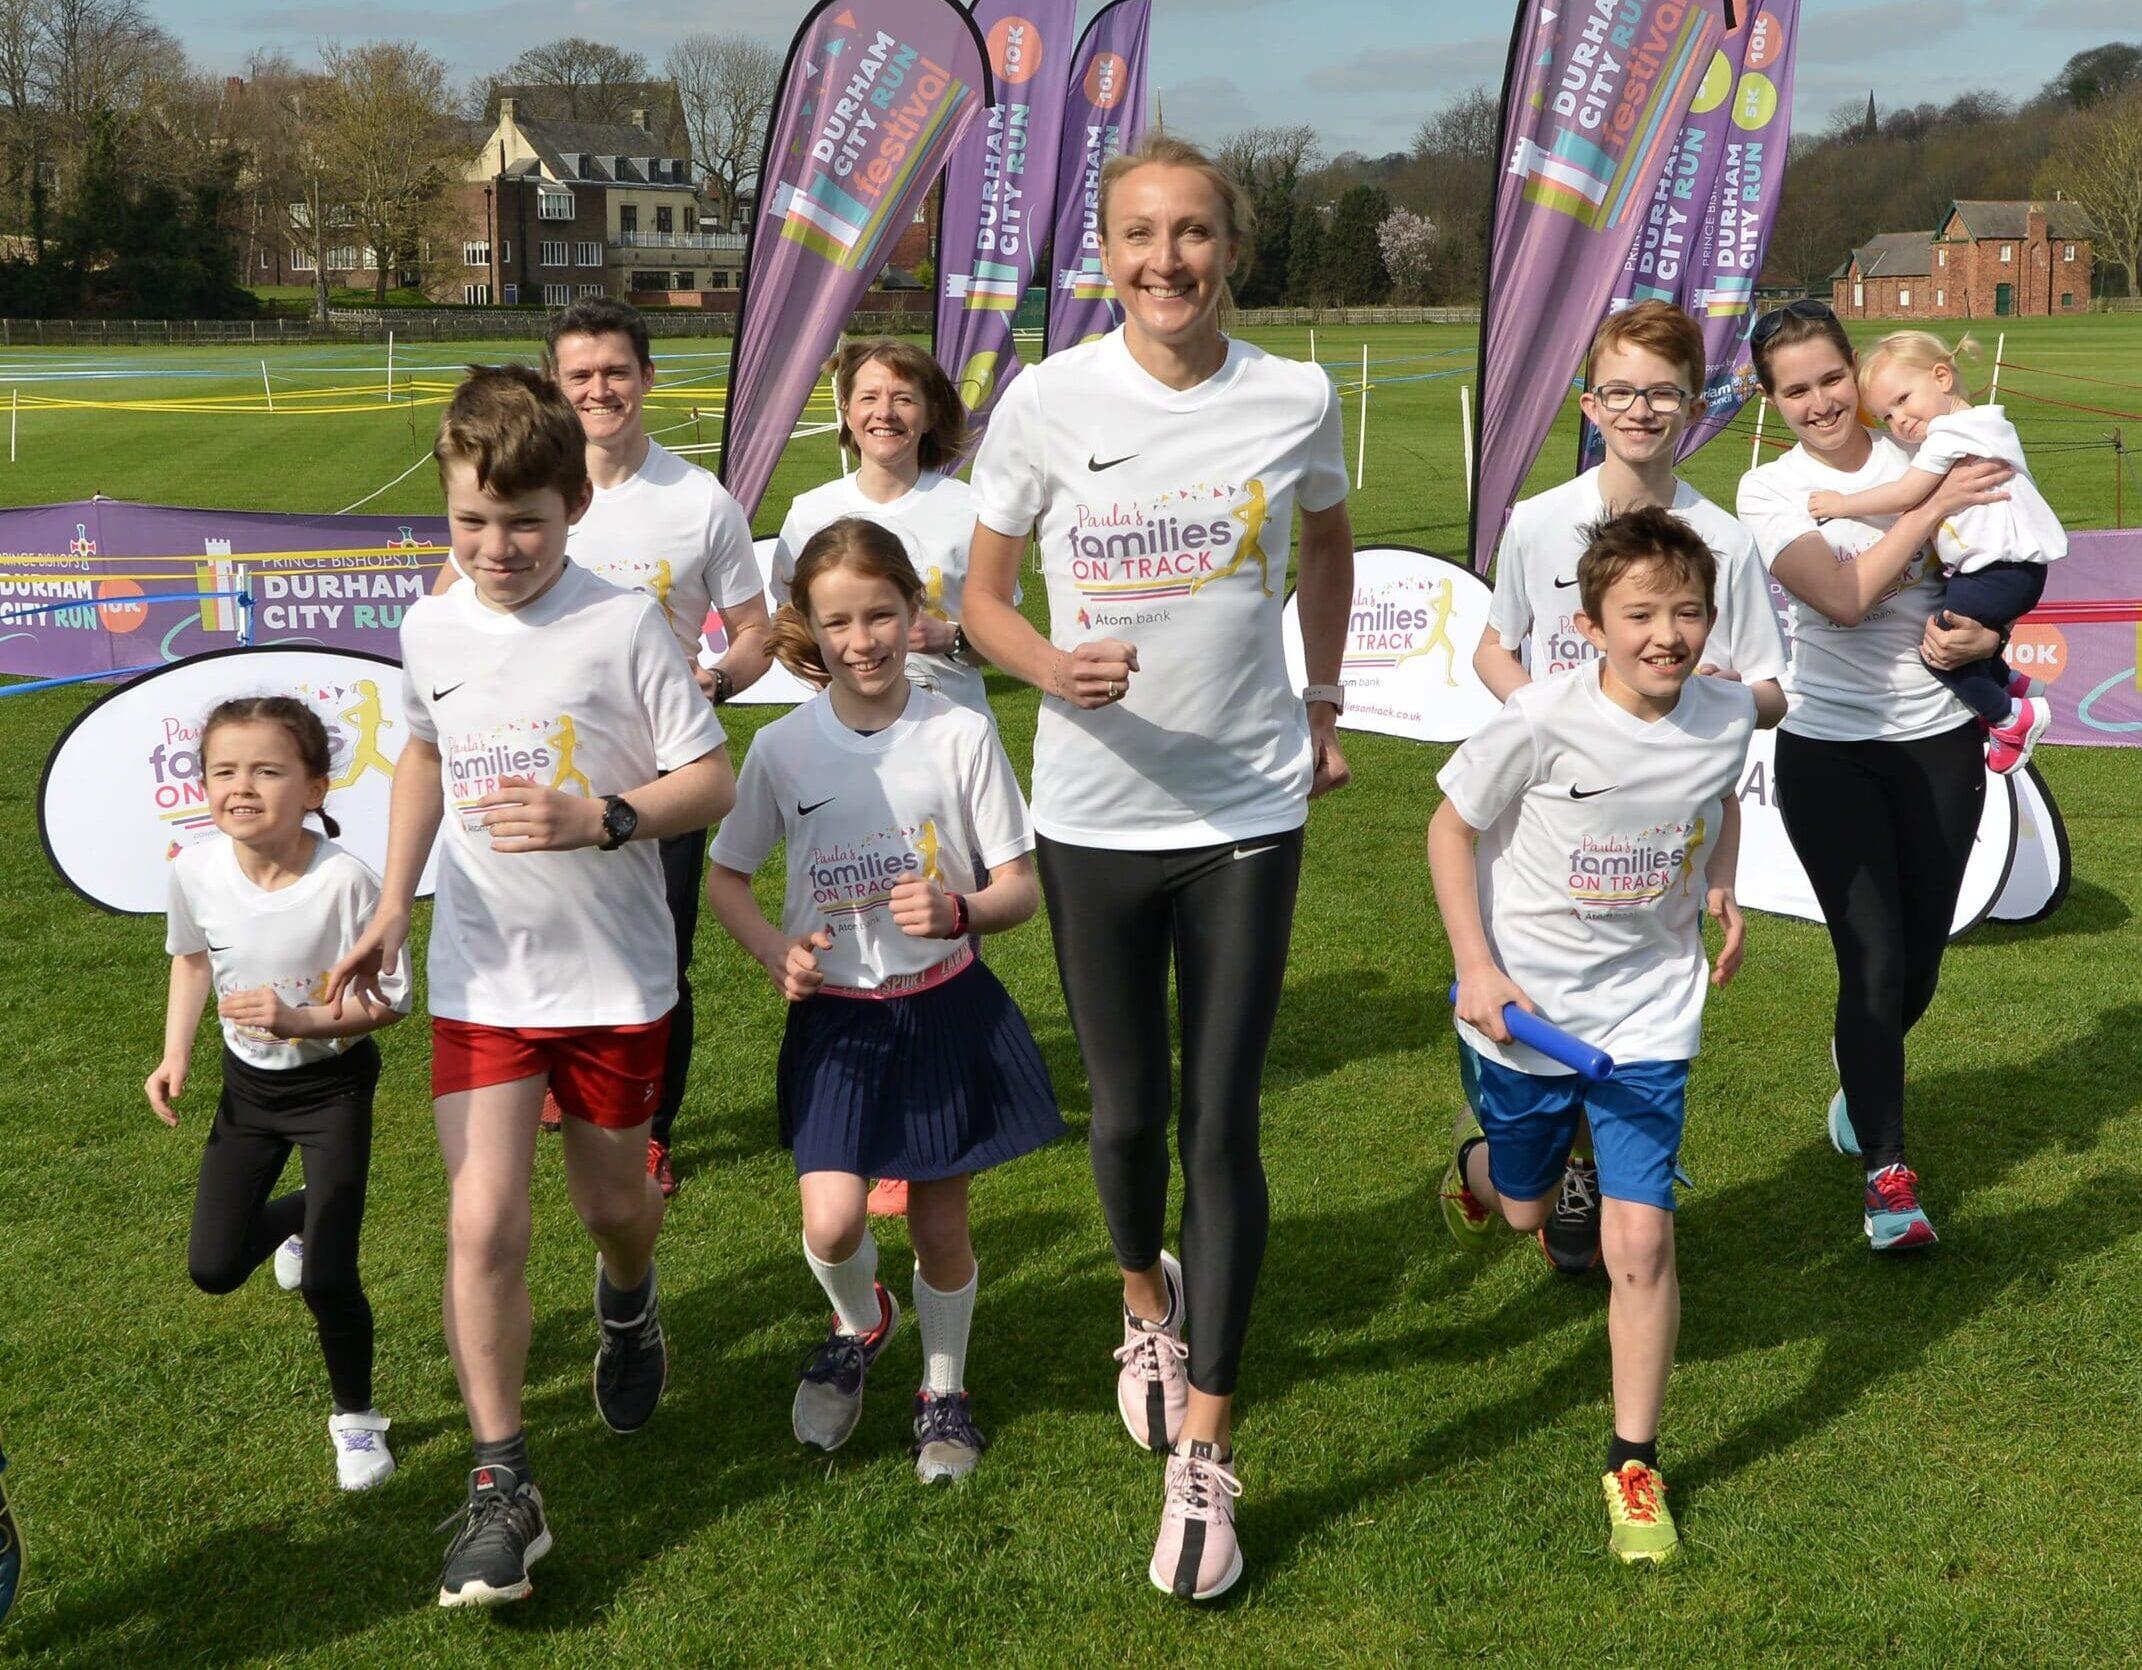 Paula Radcliffe To Get Kids Active